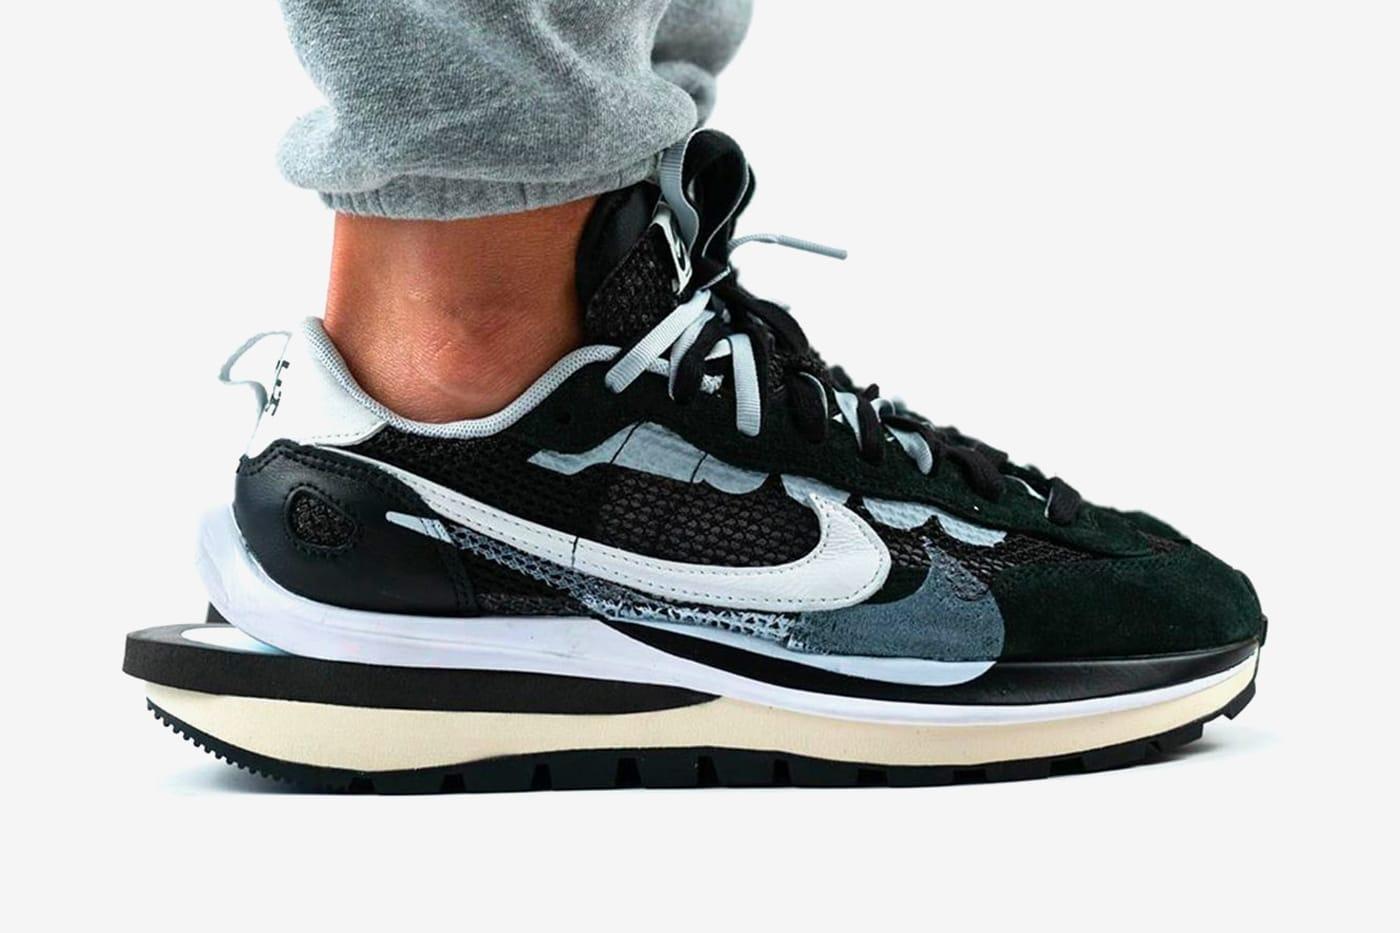 sacai x Nike Vaporwaffle Release Date